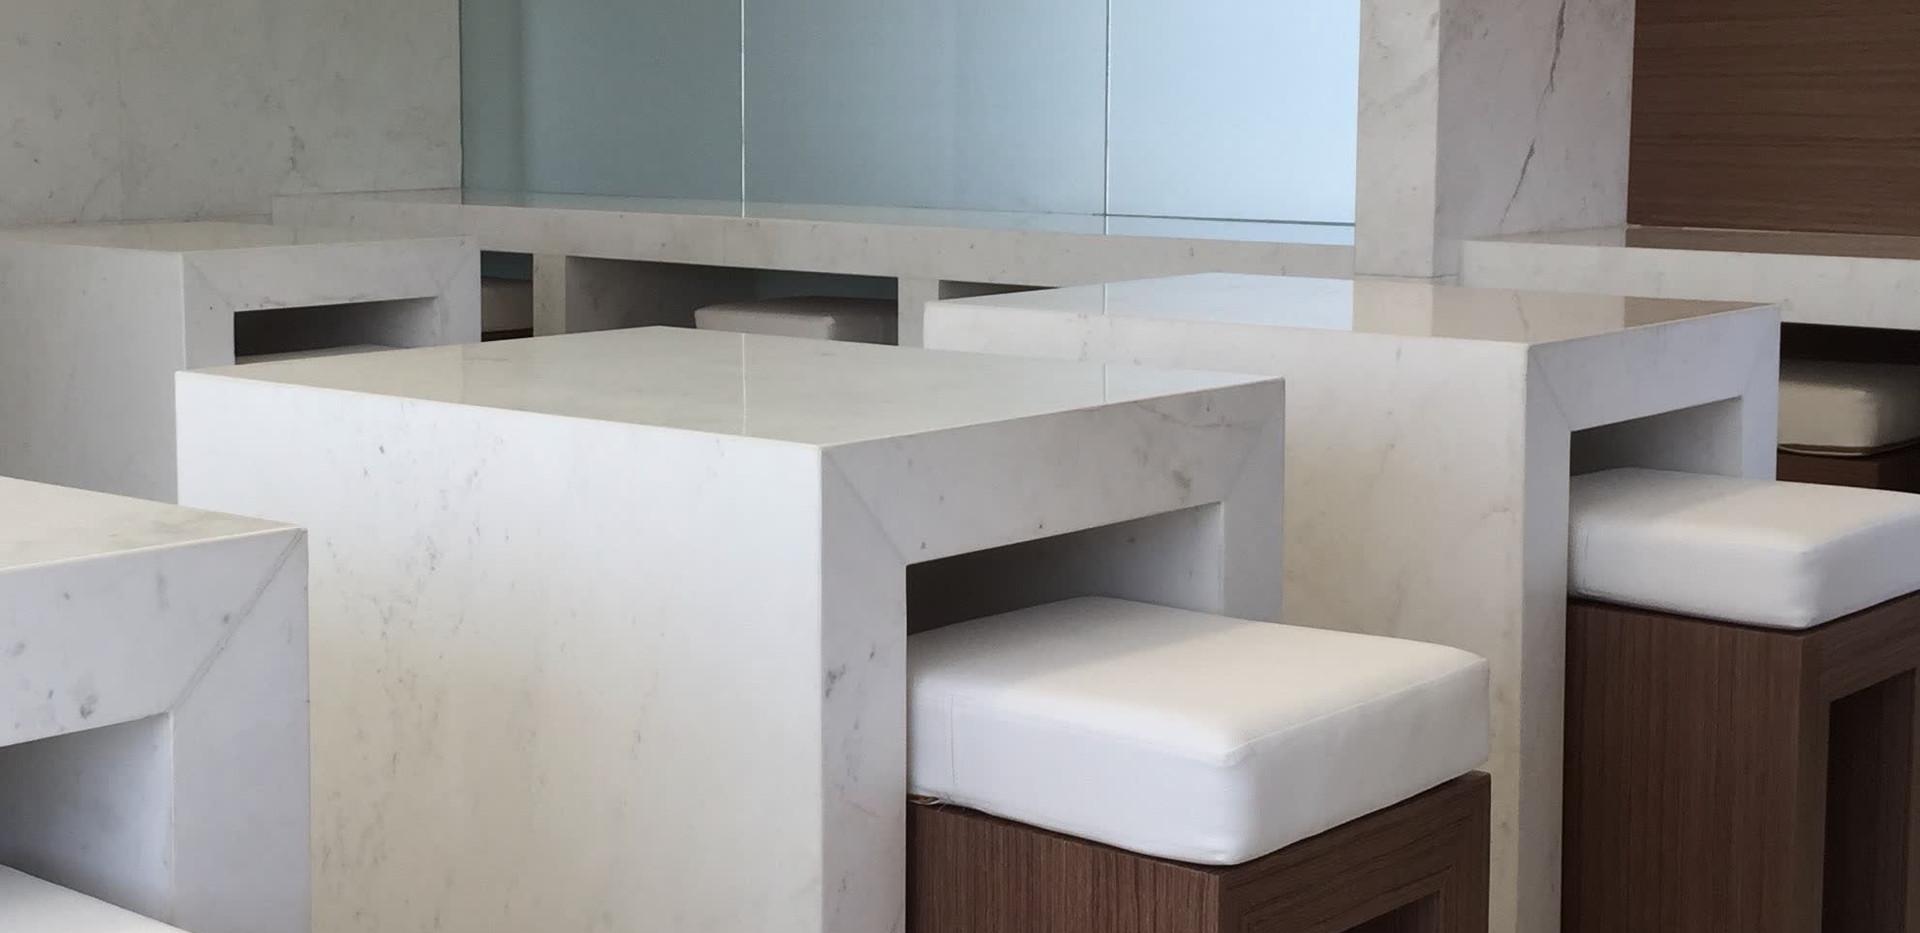 Pausa con Vista - Ernesto Fusco Interior Designer